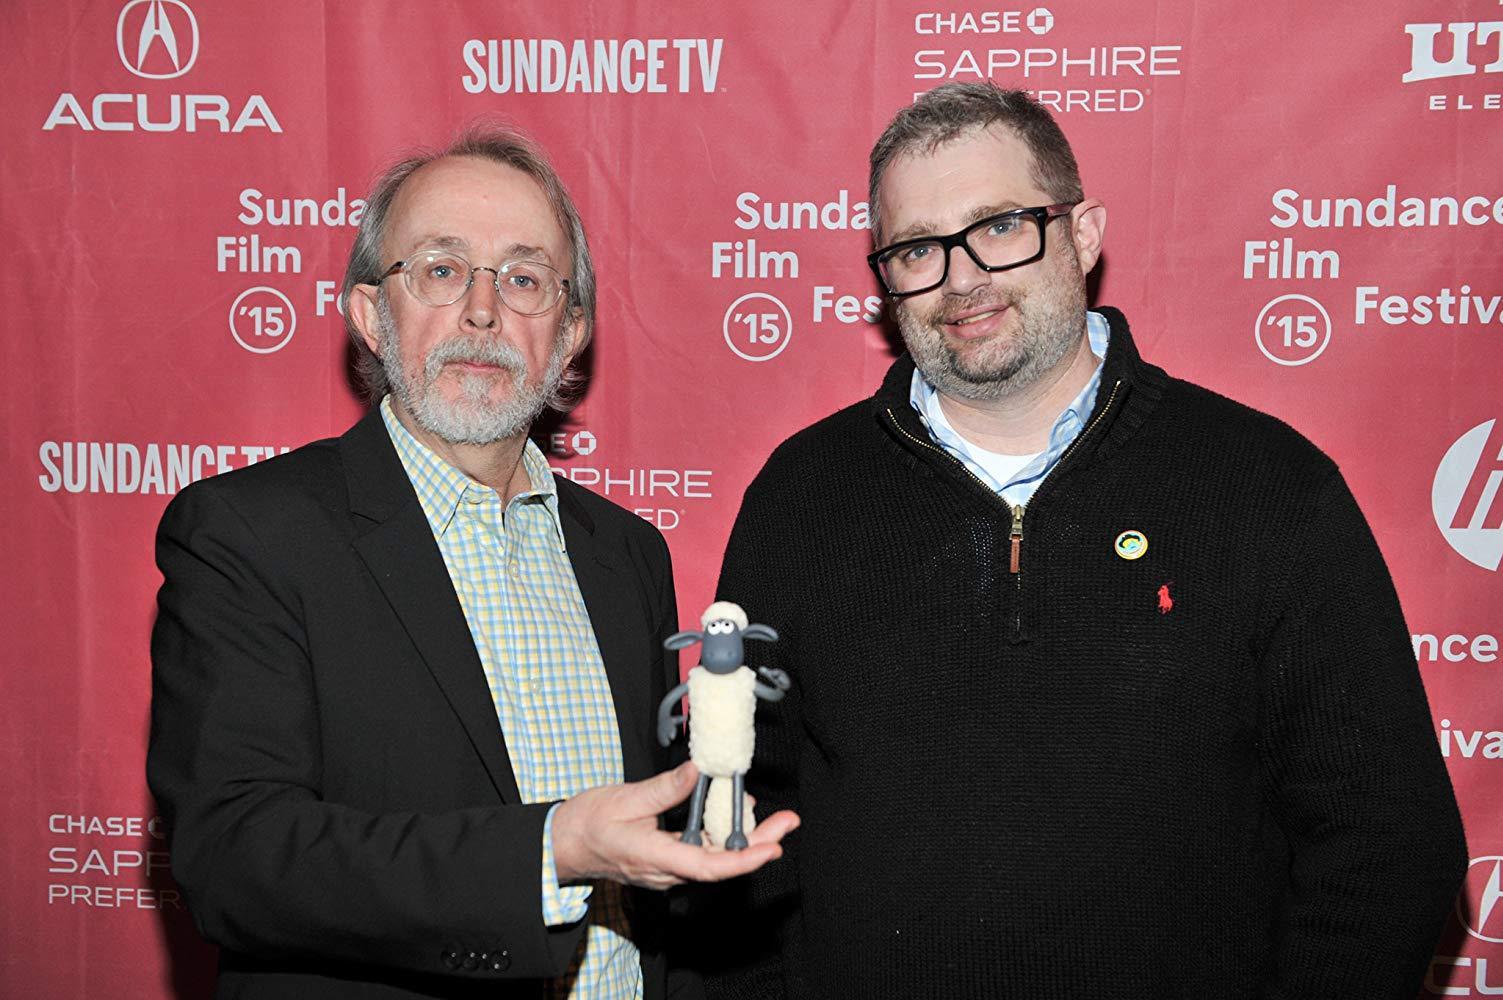 مشاهدة فيلم Shaun: the Sheep Movie 2015 HD مترجم كامل اون لاين